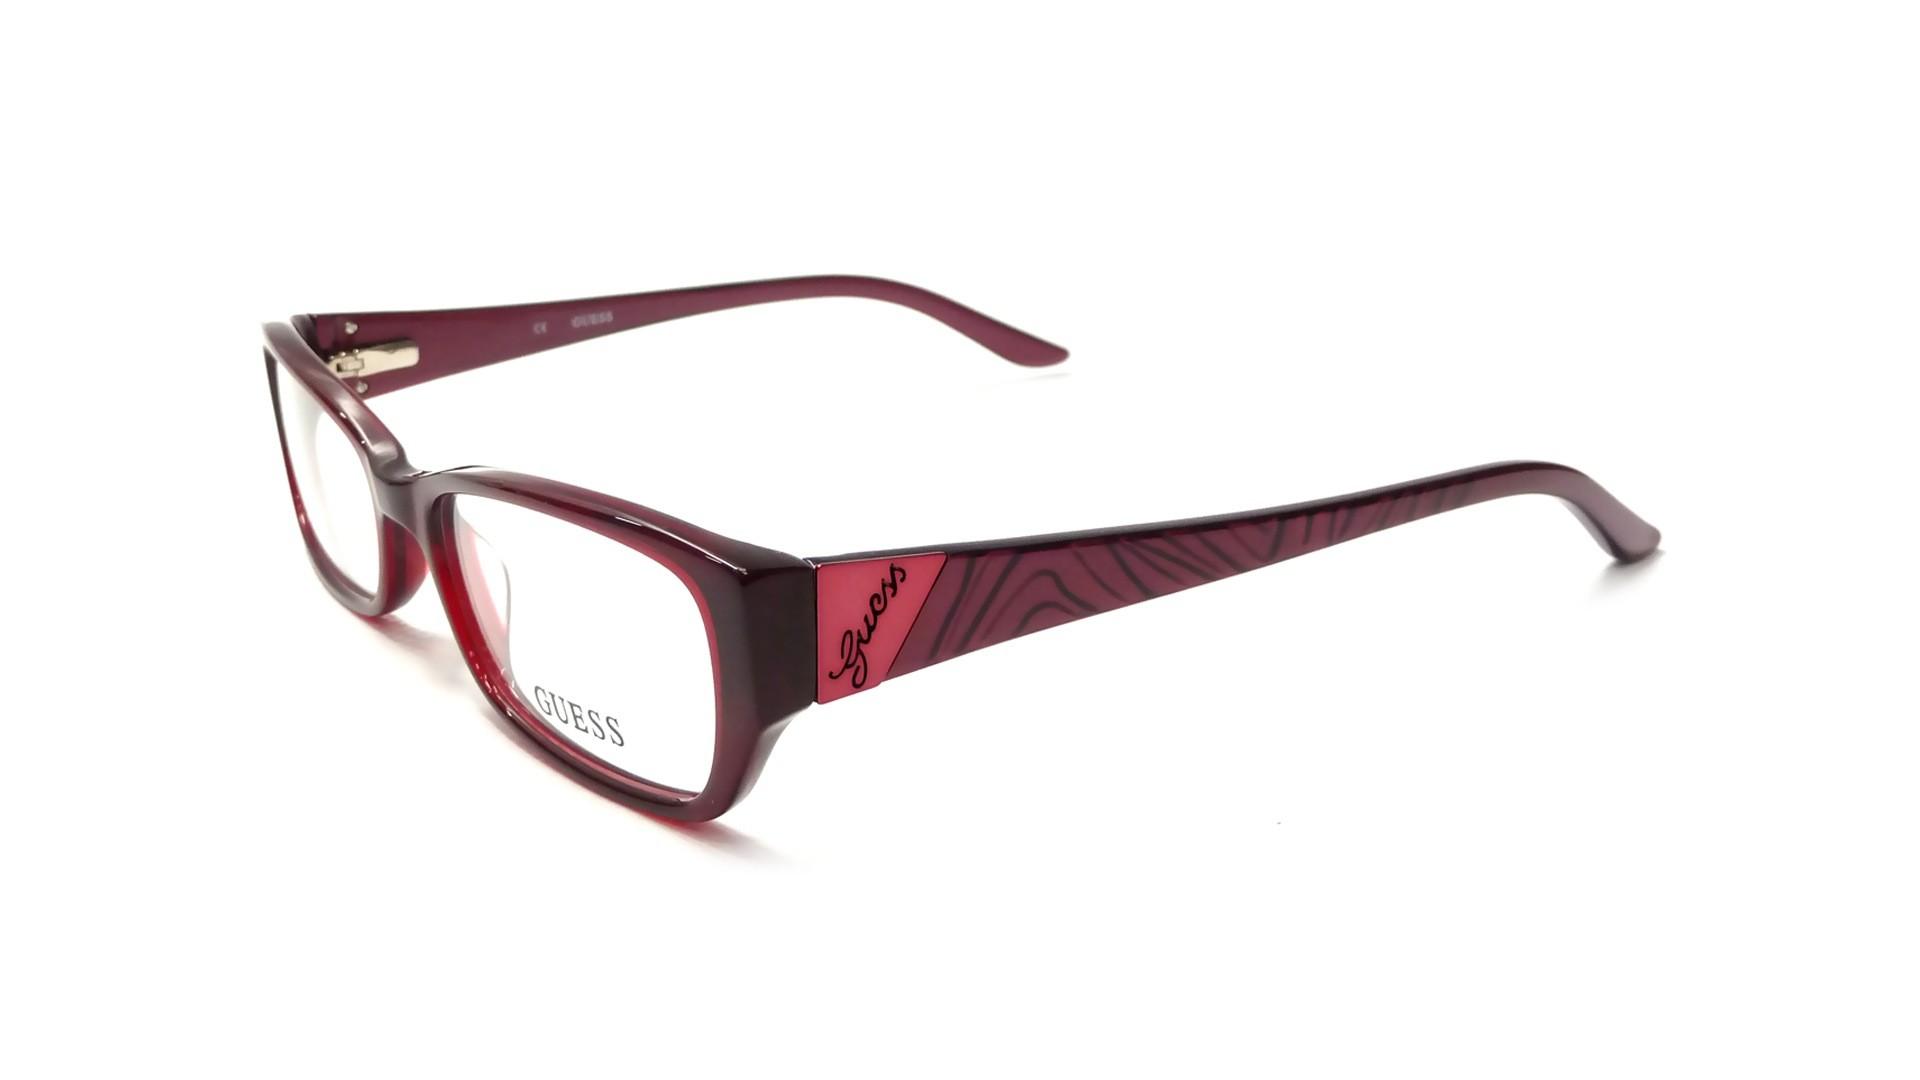 Guess Red Eyeglass Frames : Guess GU2305 BU 52-16 Red Visiofactory